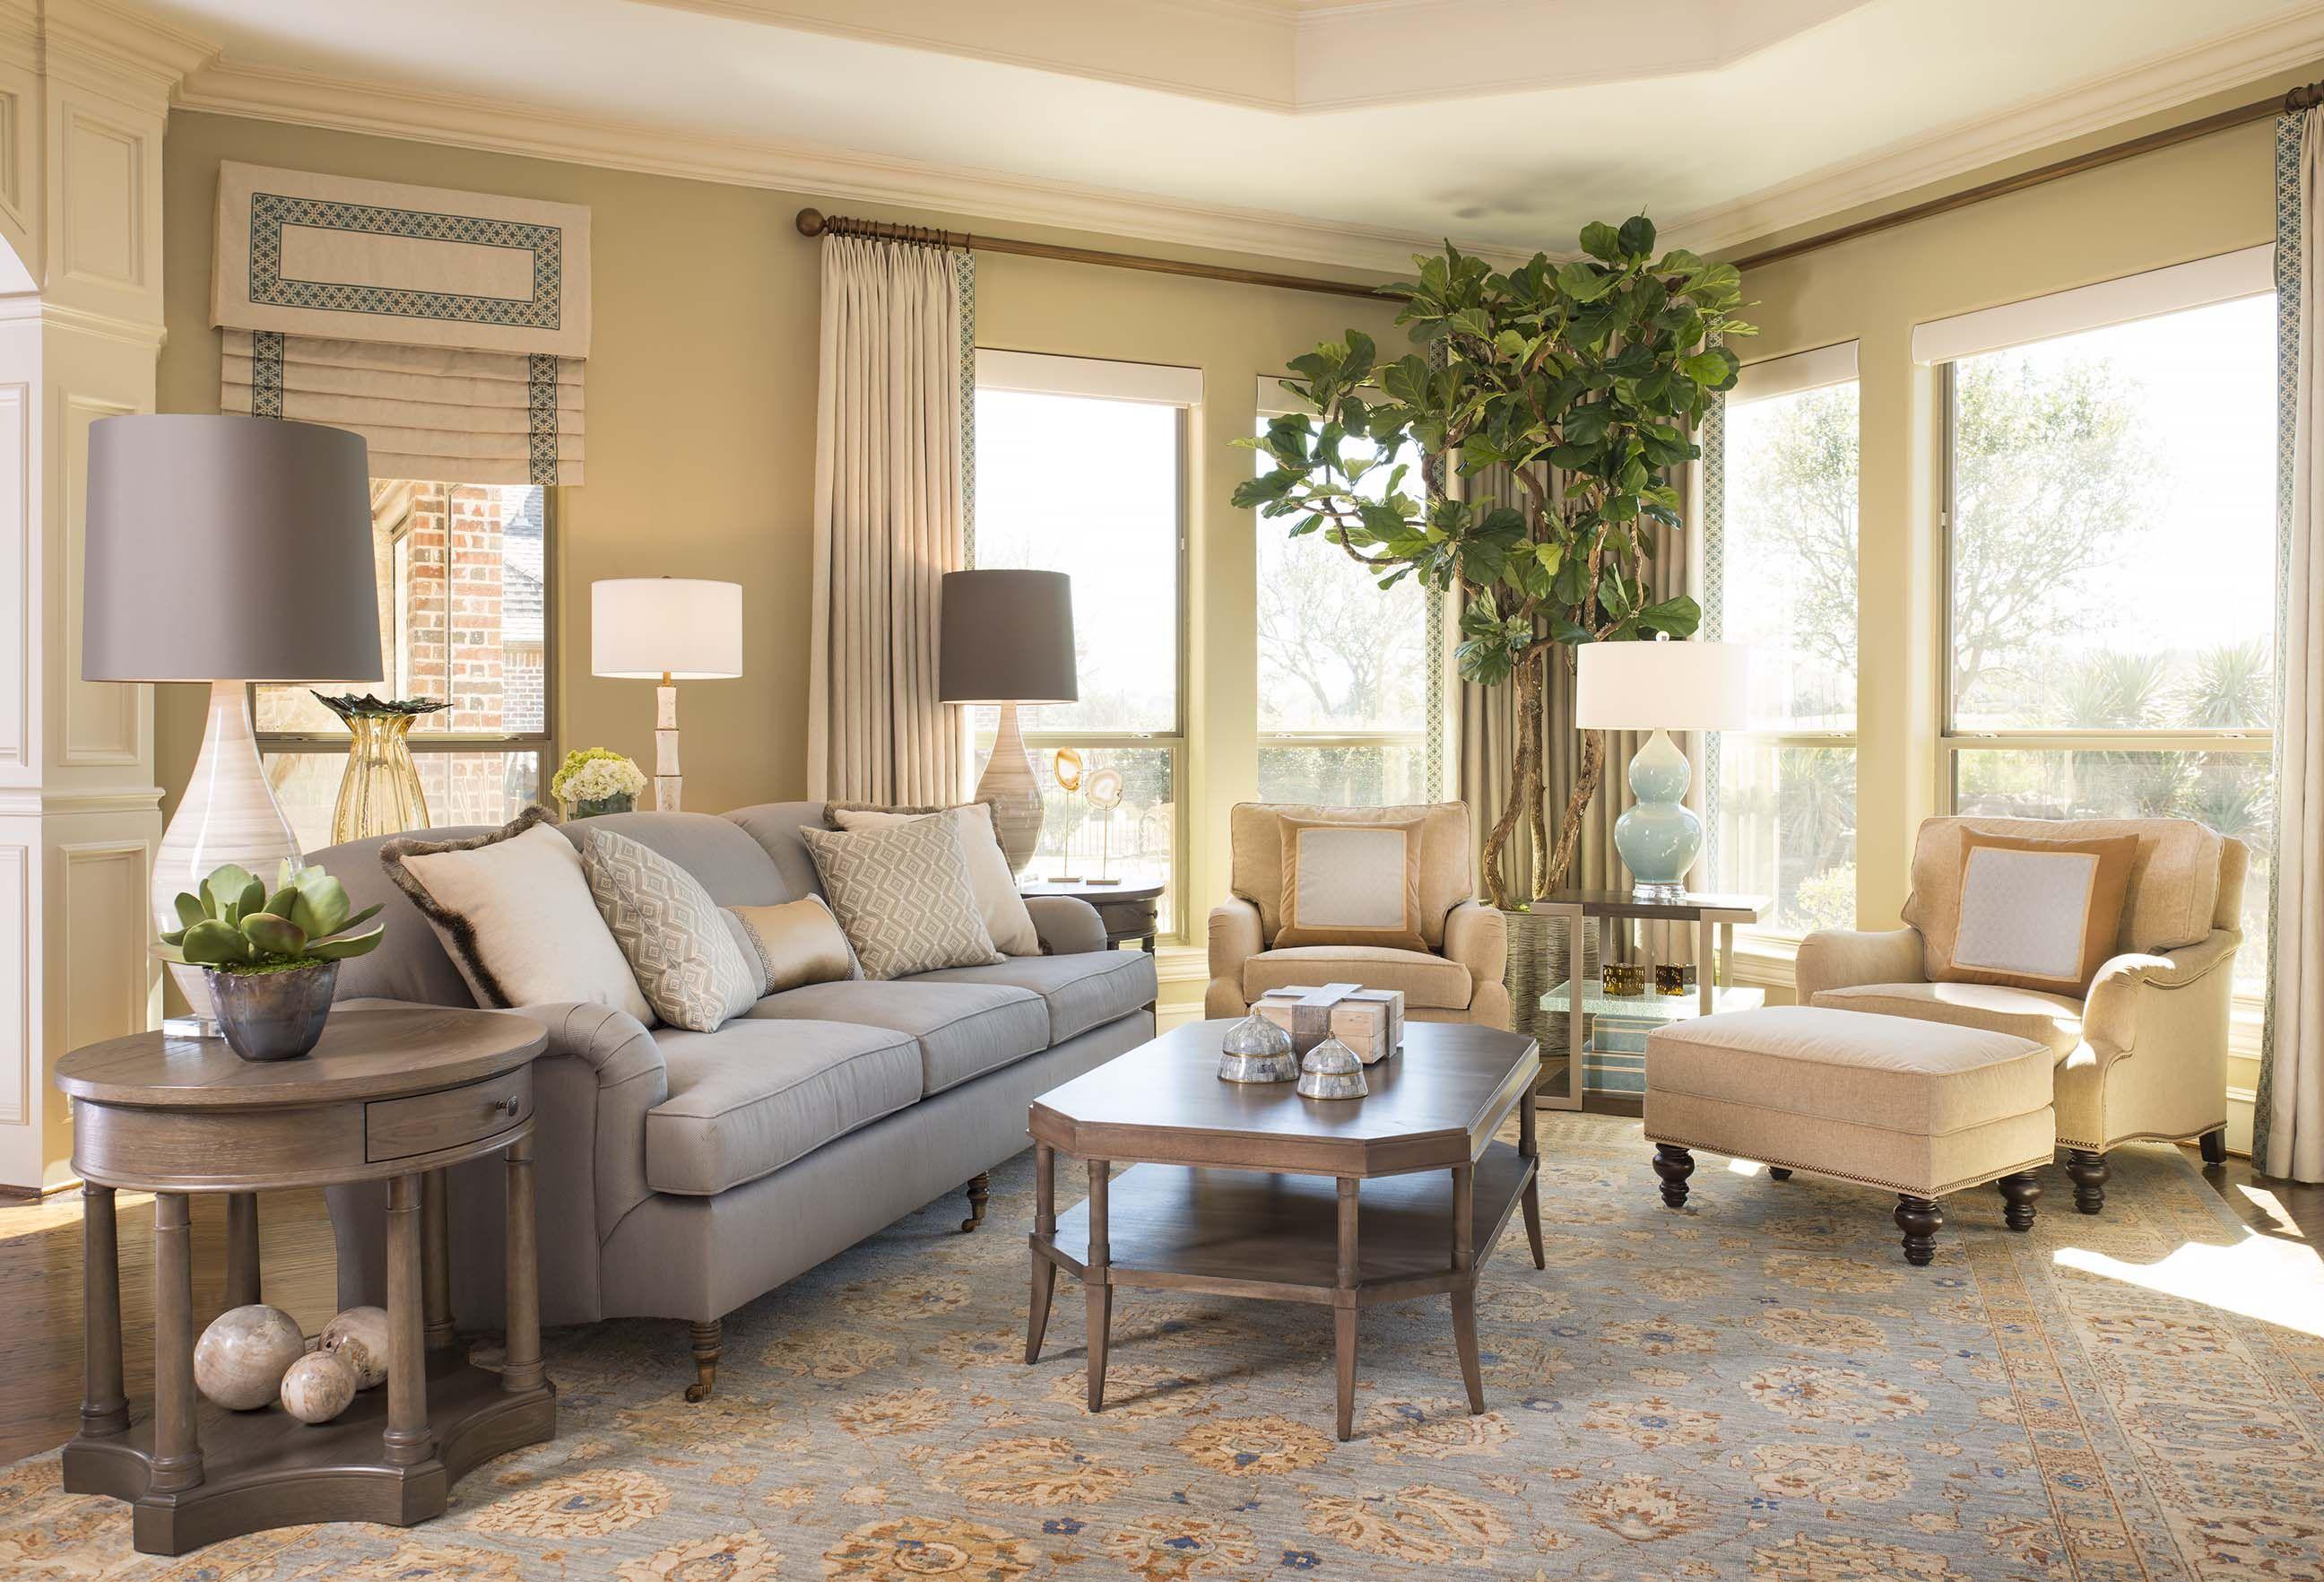 Living Room Design Interiors Dallasdesigngroup Tranquility